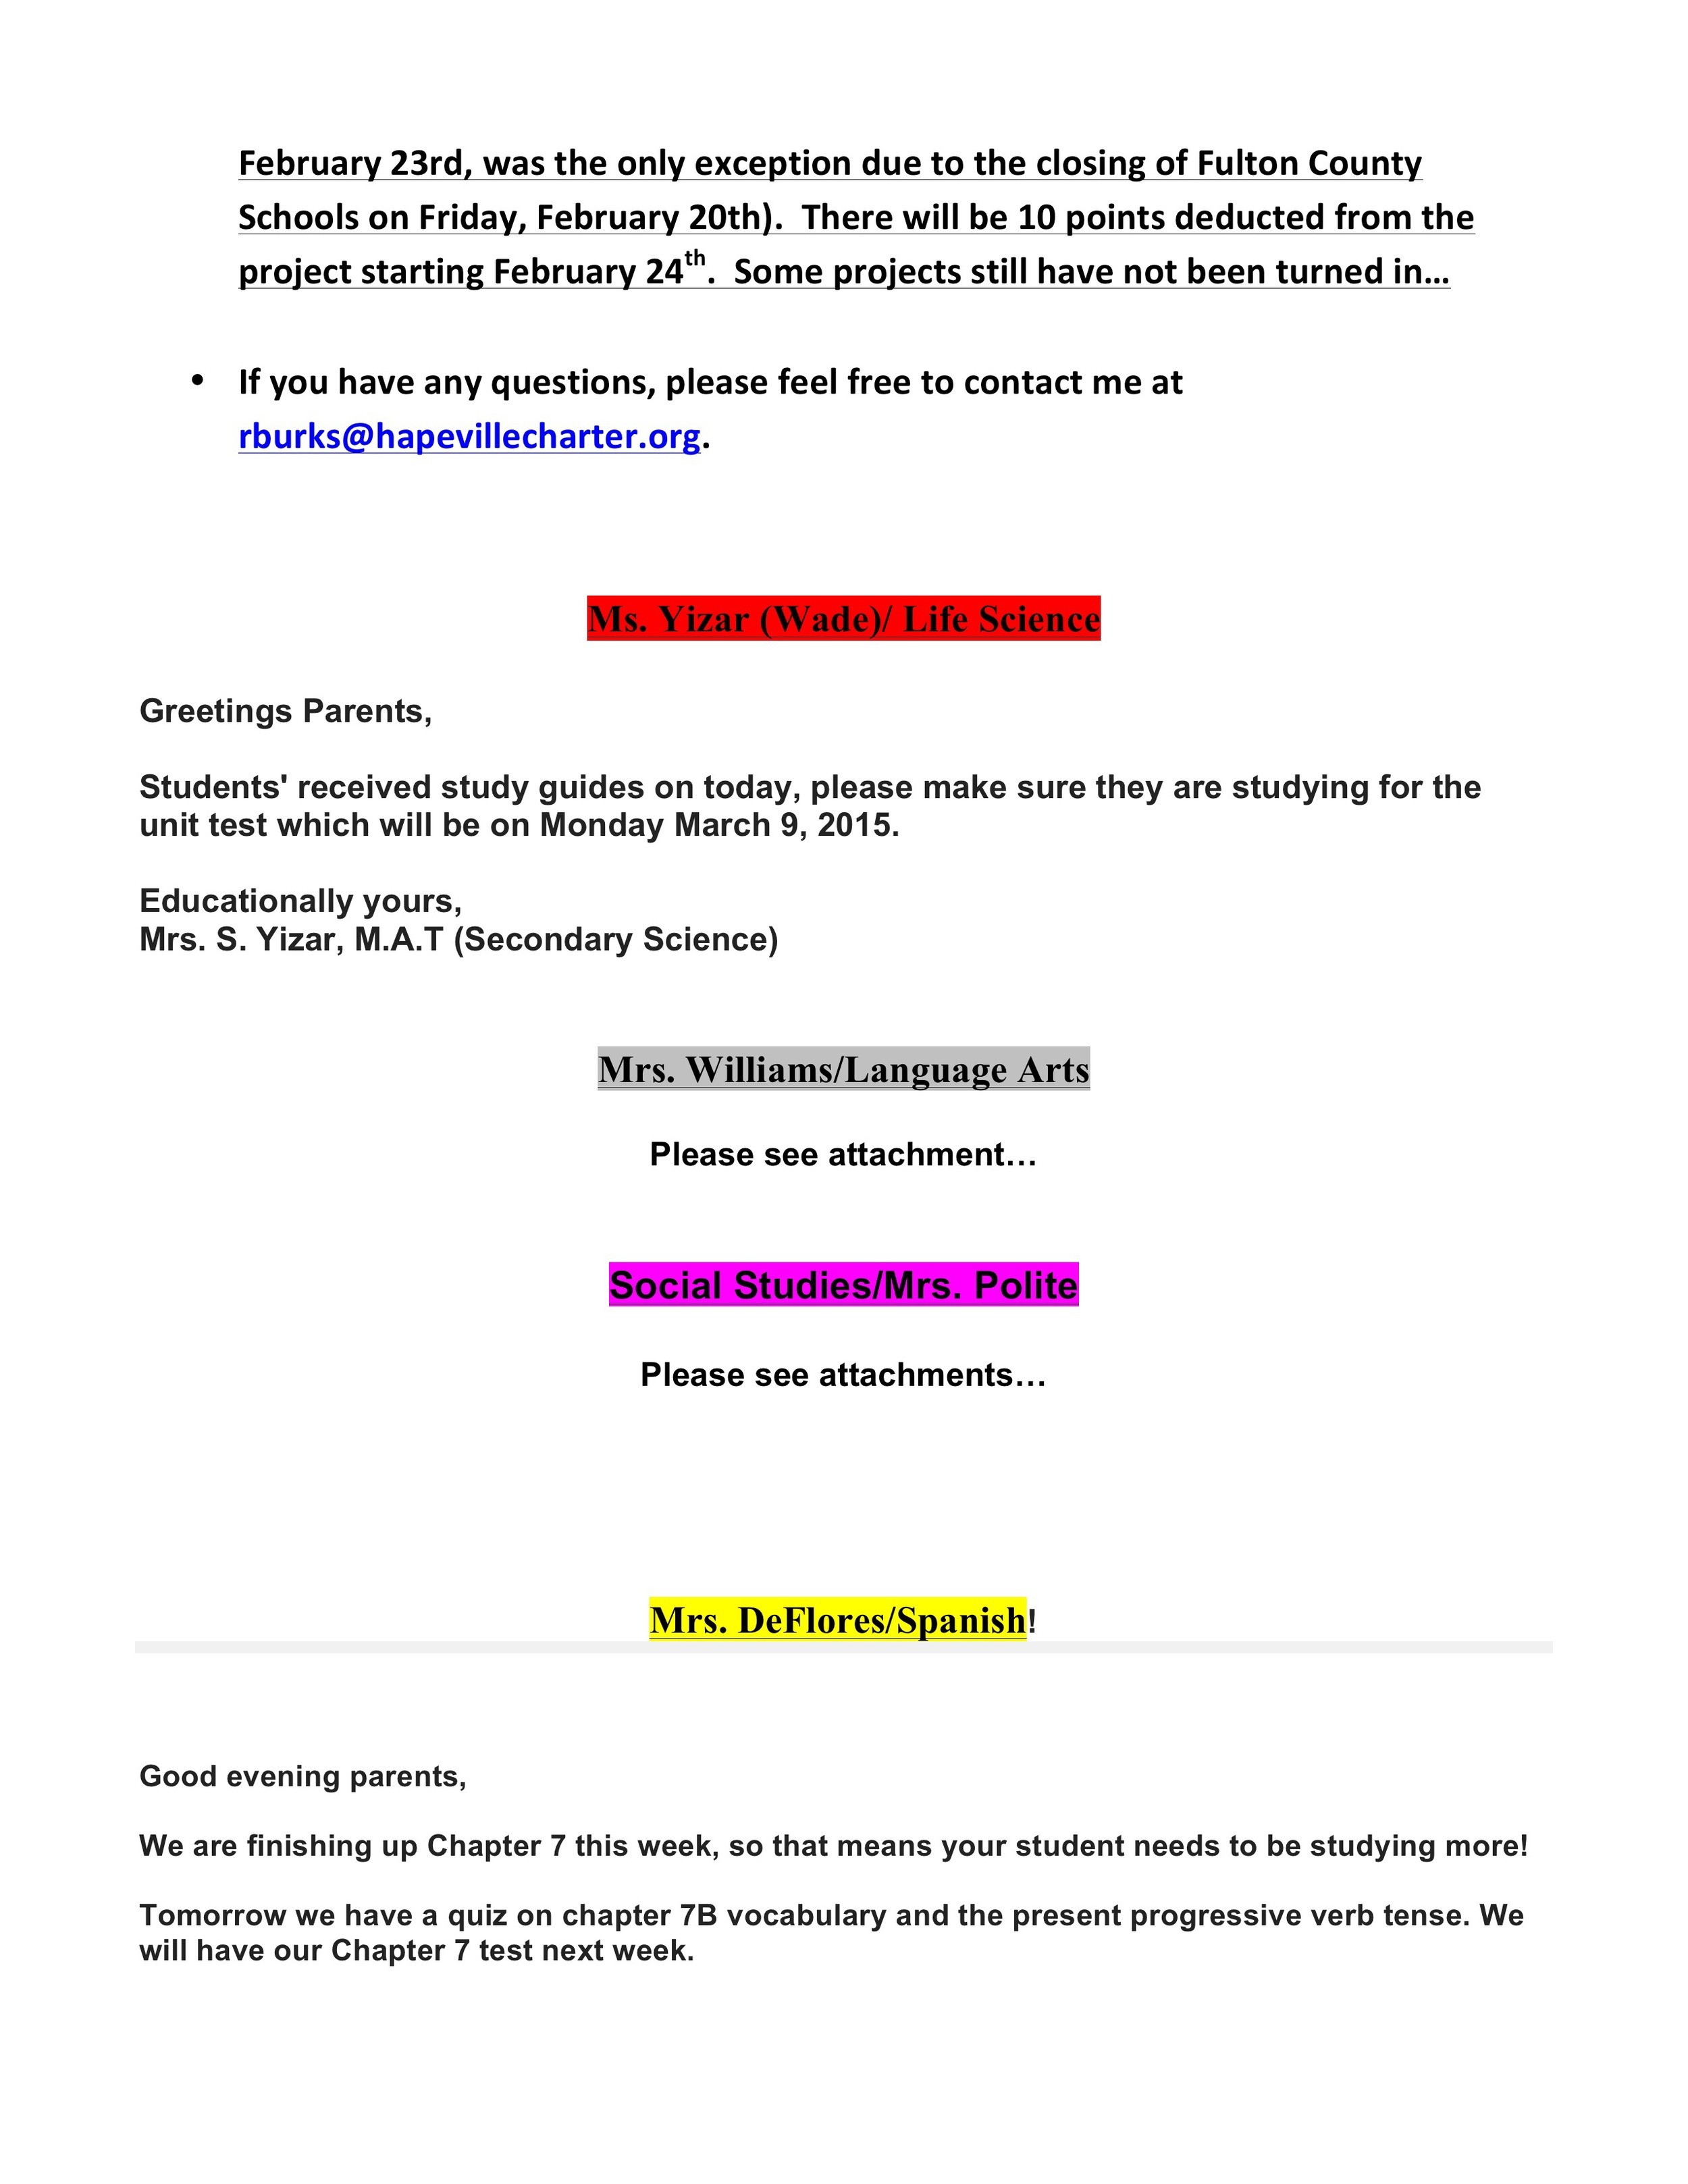 Newsletter Image7th grade 3-2-15 4.jpeg